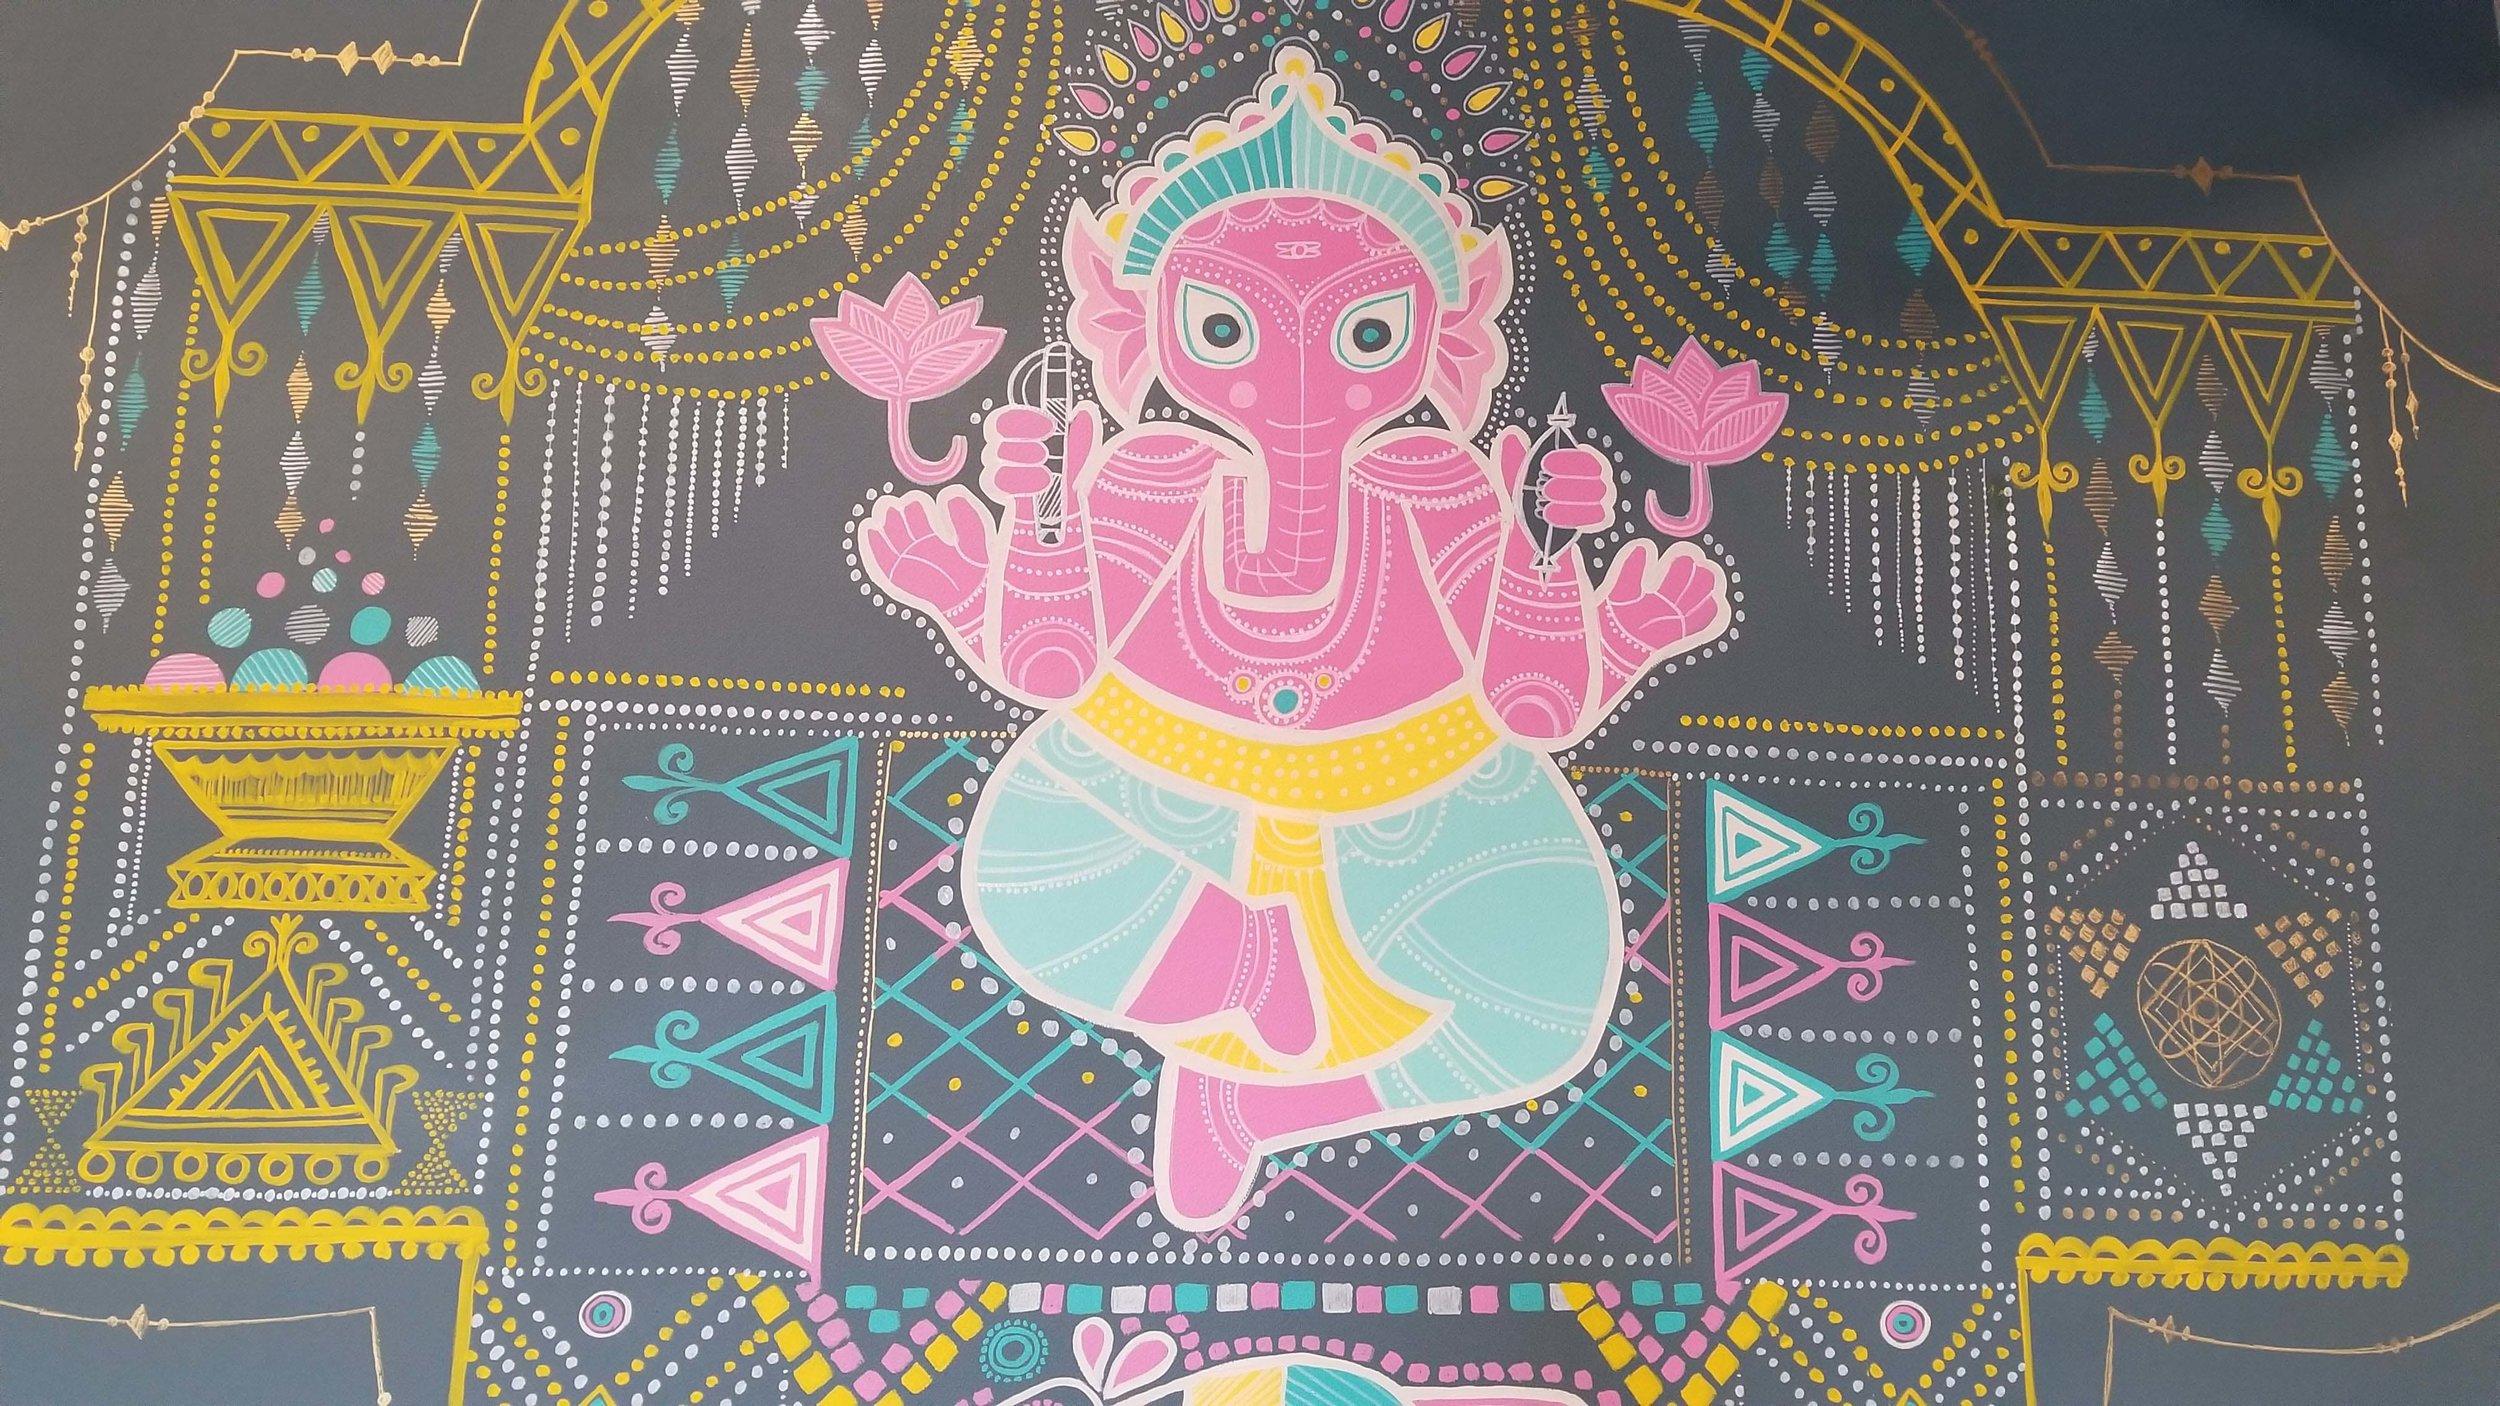 Ganesh Mural Wall Painting Brampton Jasmin Pannu.jpg